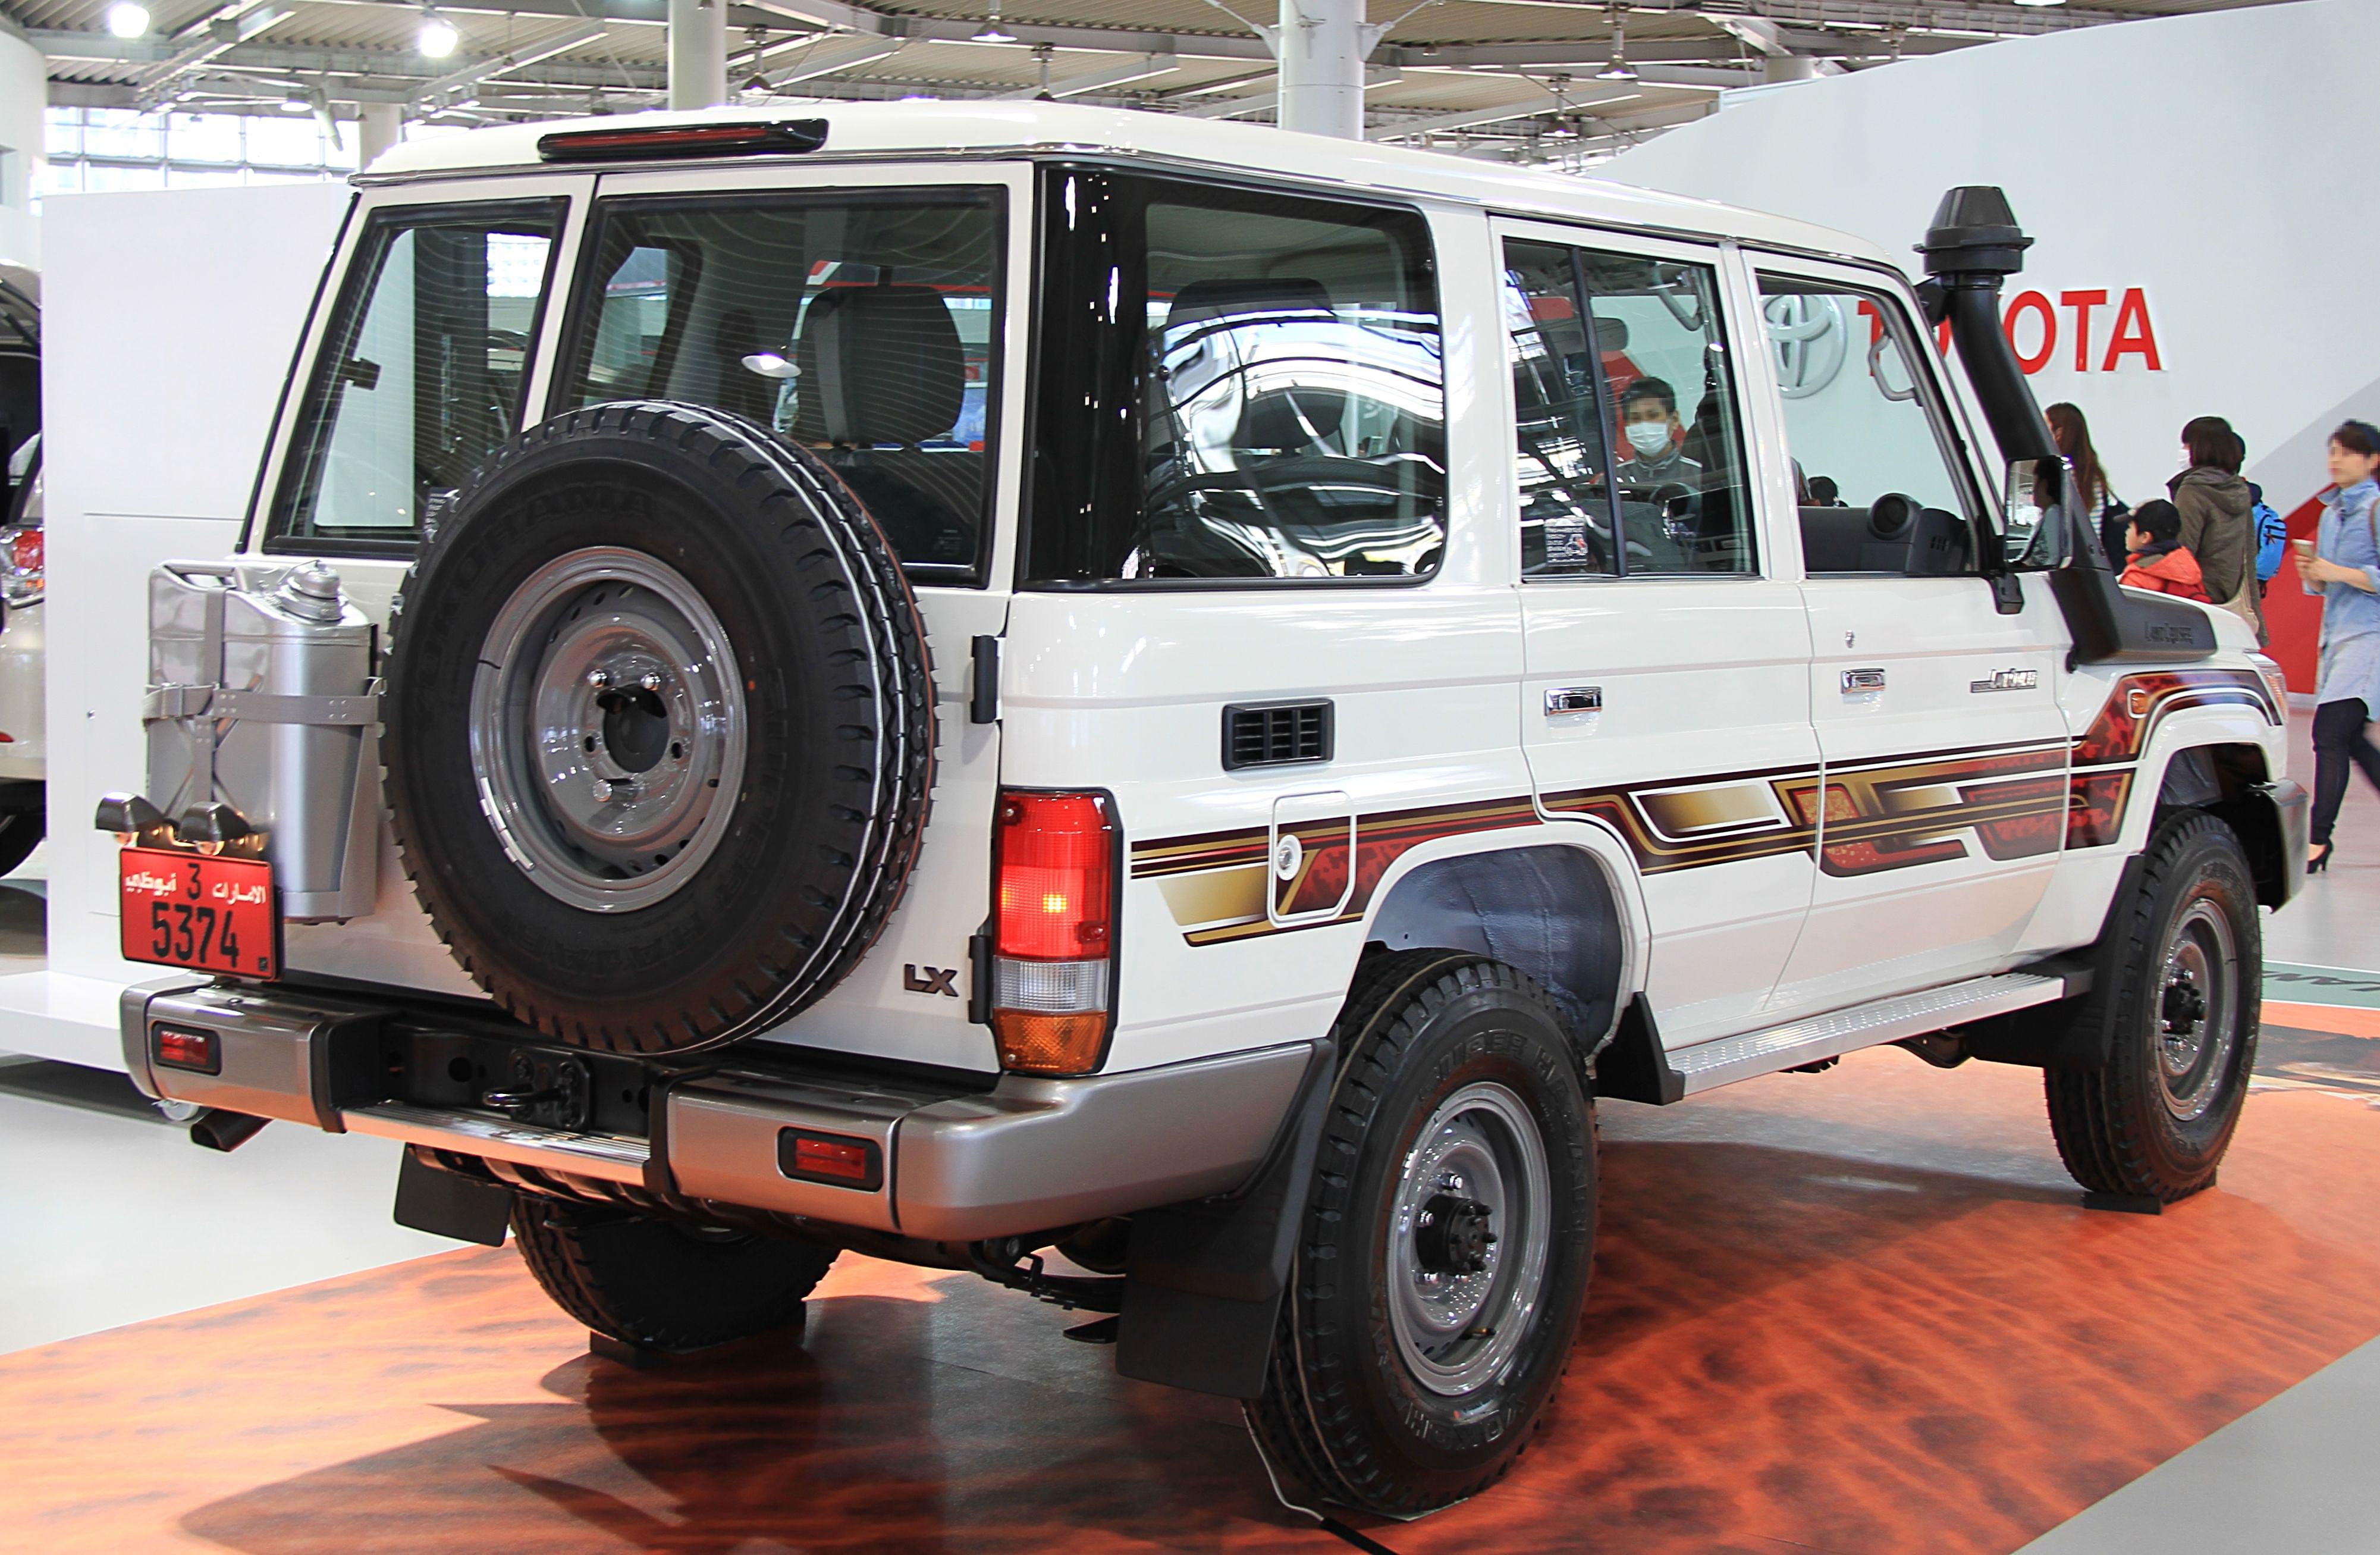 Kekurangan Toyota Lx Tangguh